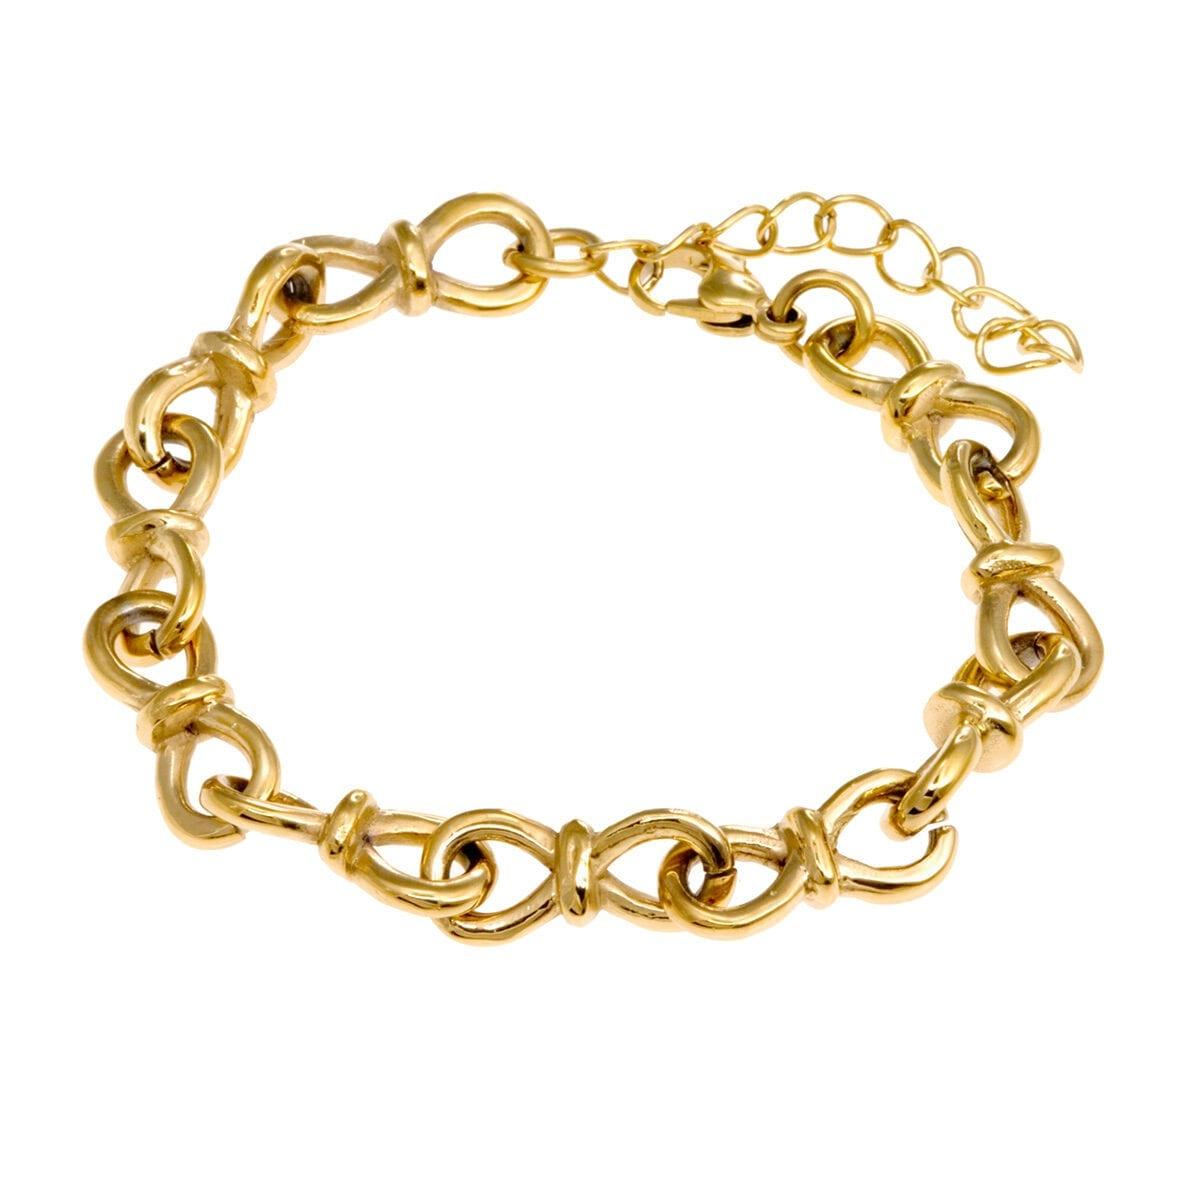 Victoria-bracelet-gold